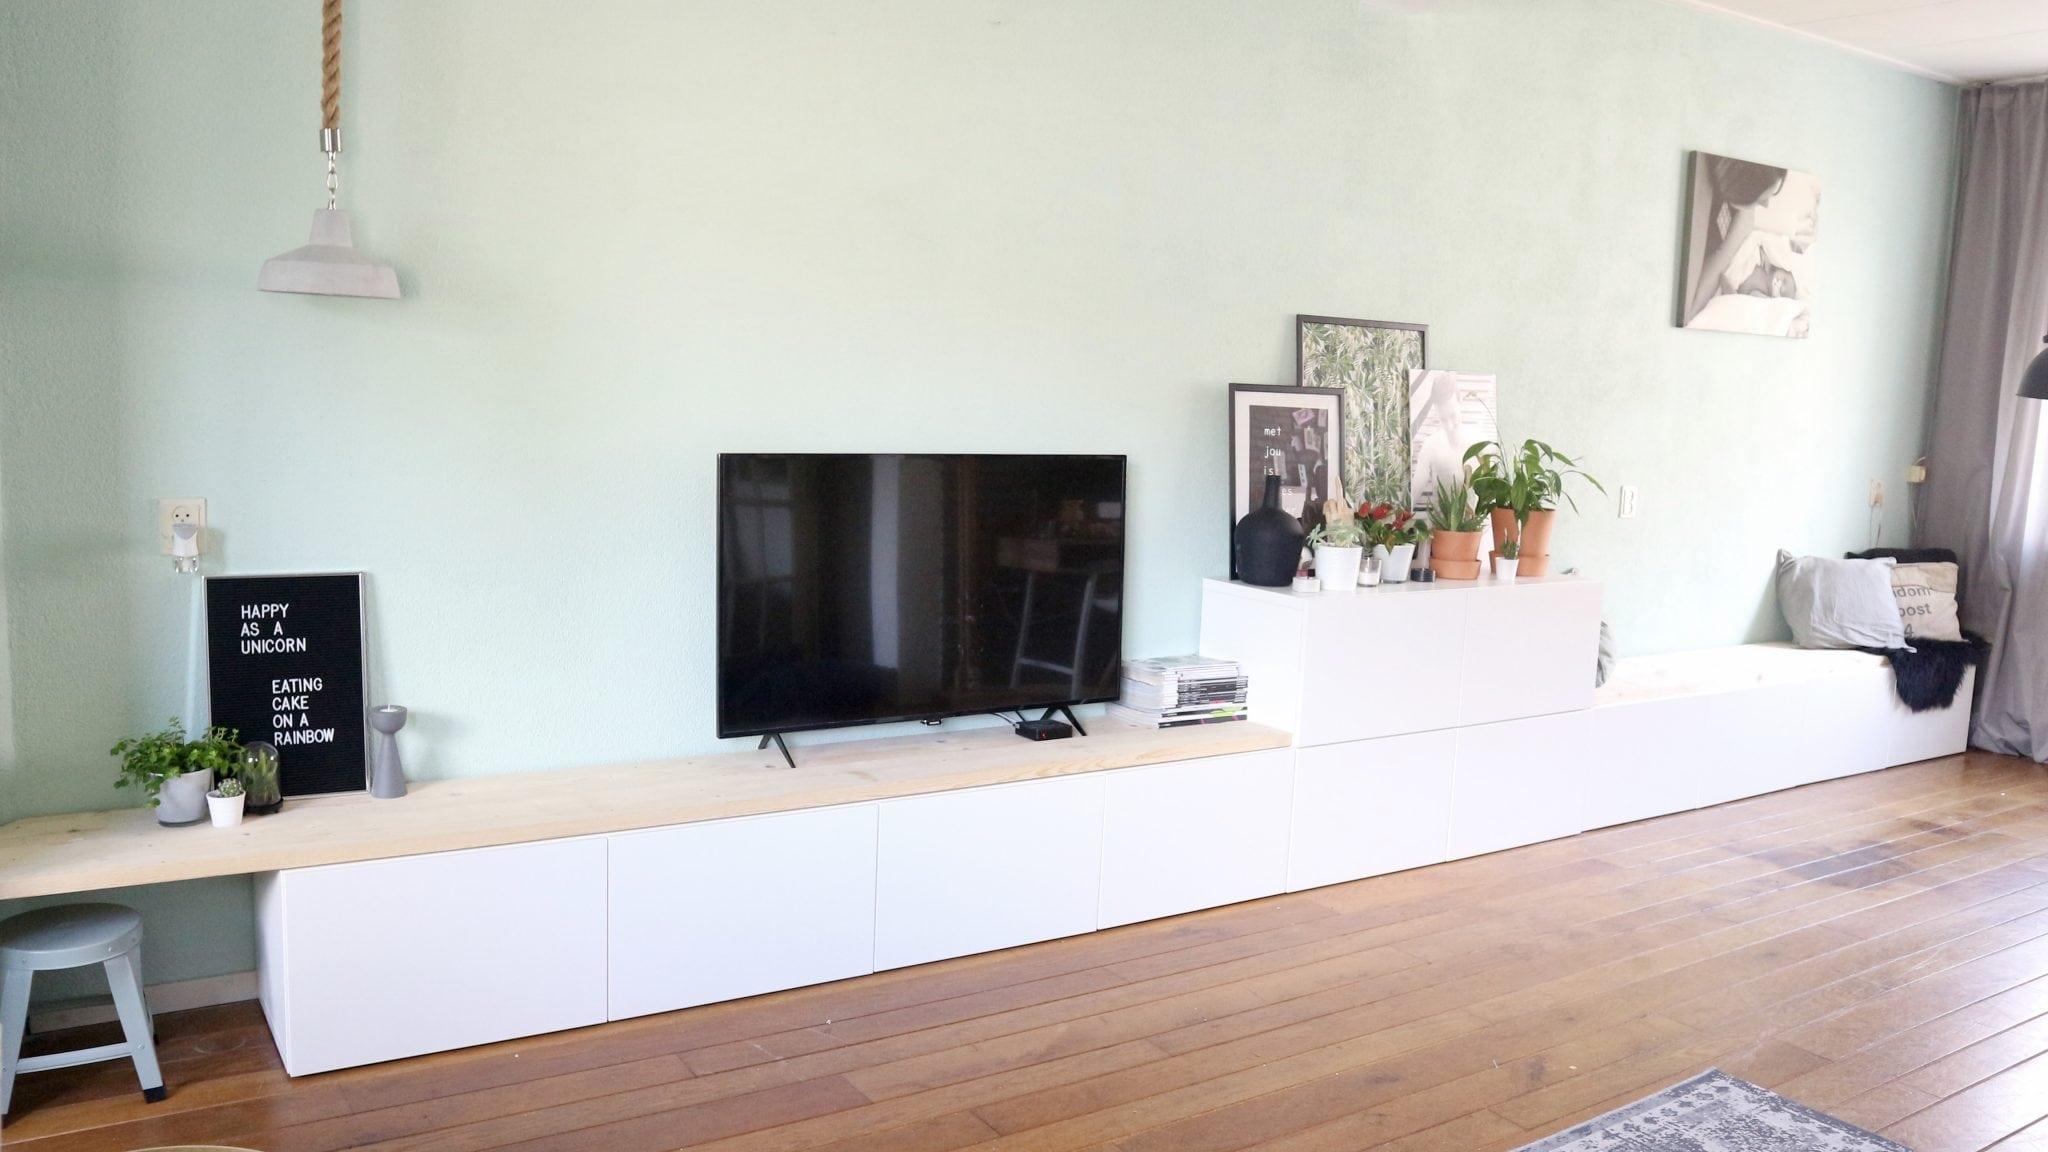 Ikea Tv Meubel Combinatie.Ikea Besta Hack Ikea Besta 2 In 1 Zitbank Tv Meubel